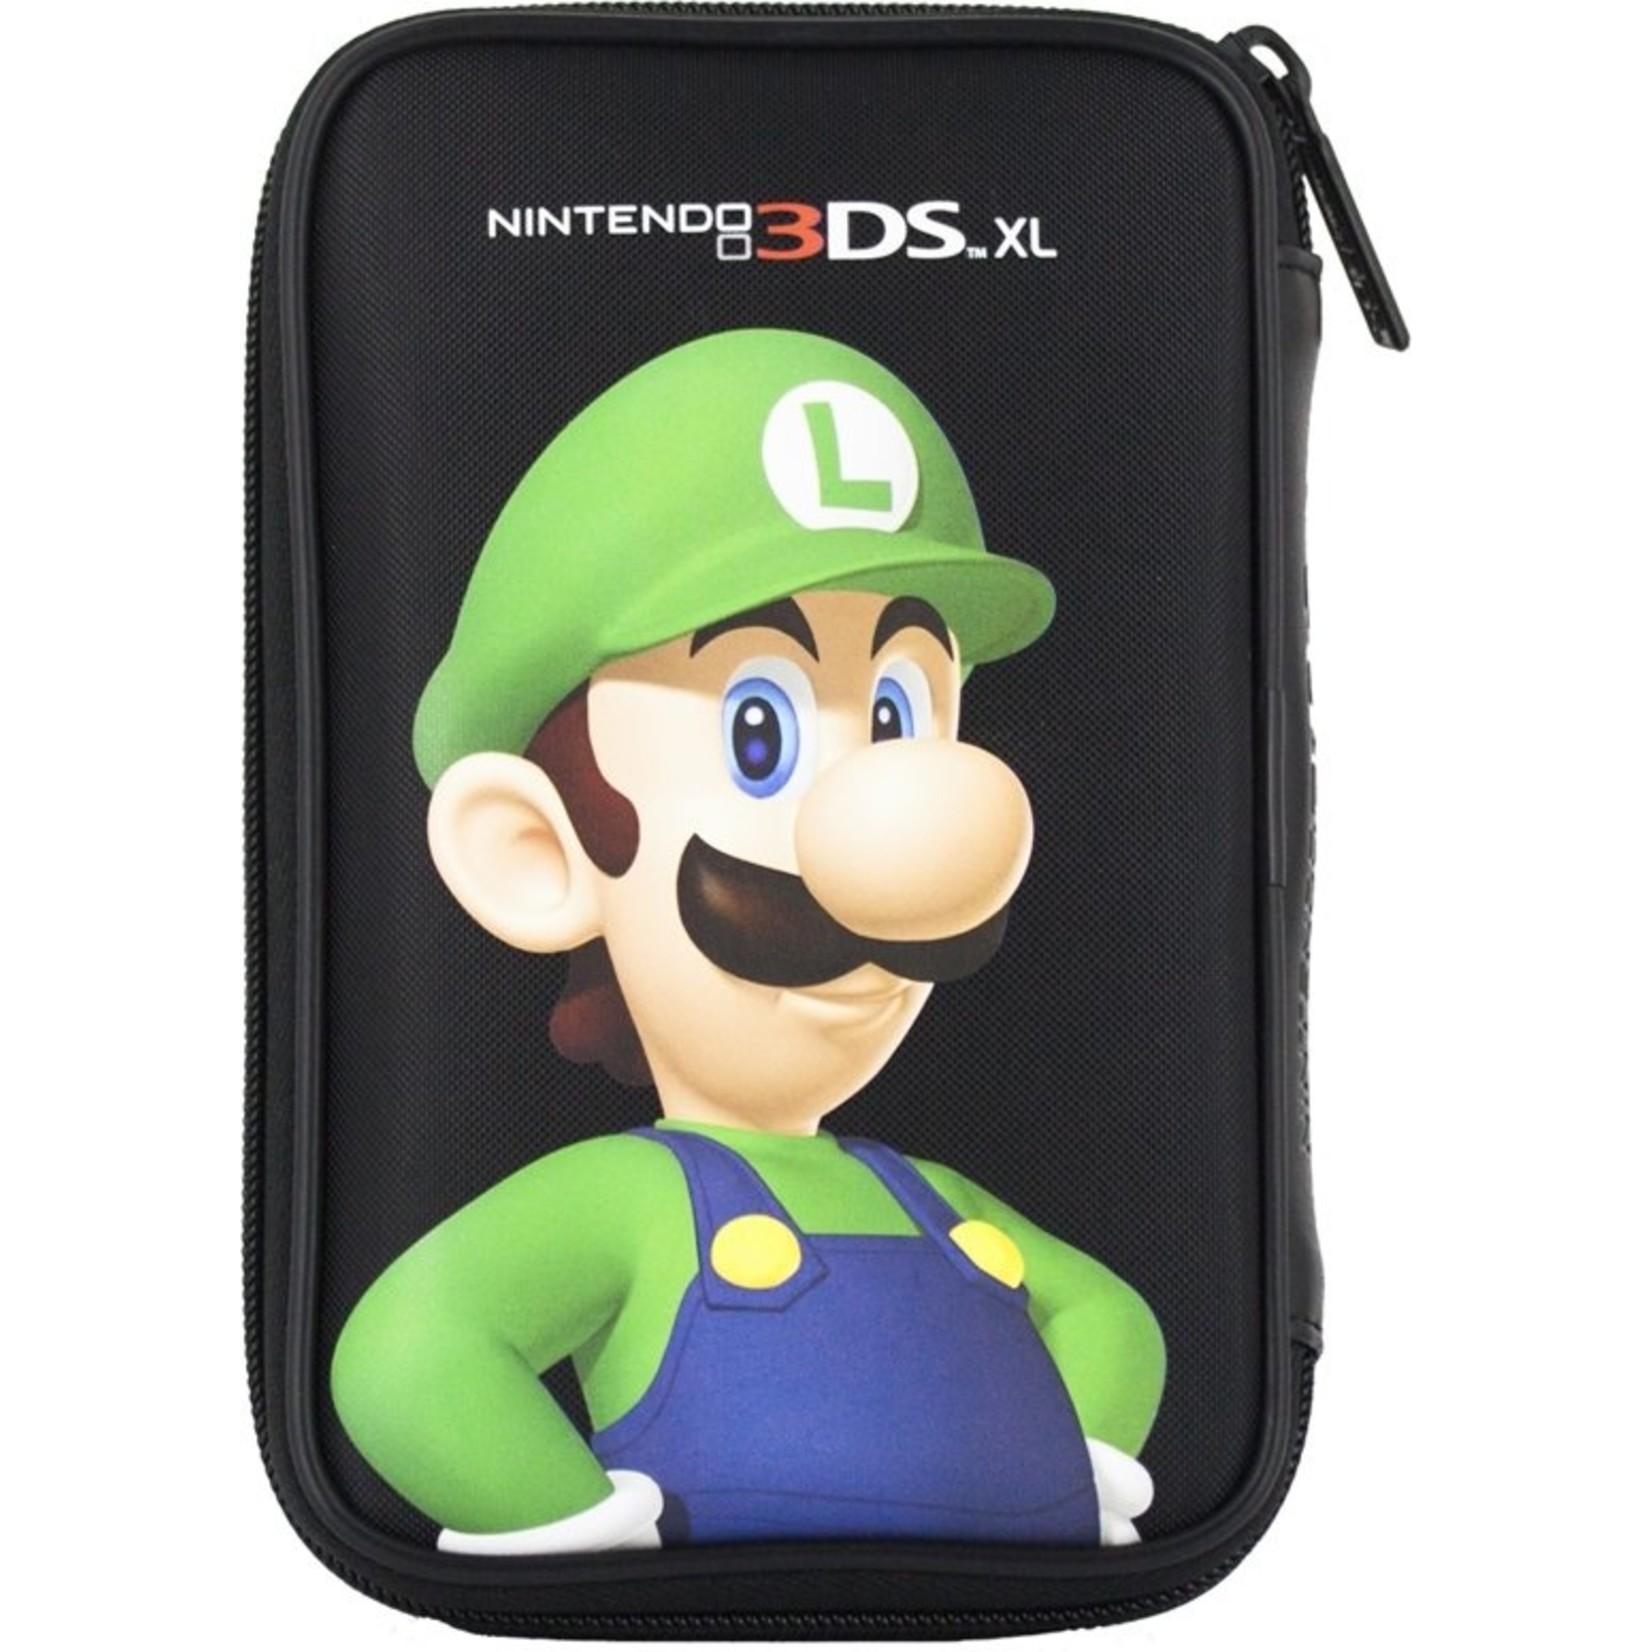 Nintendo 3DS XL case (Luigi)